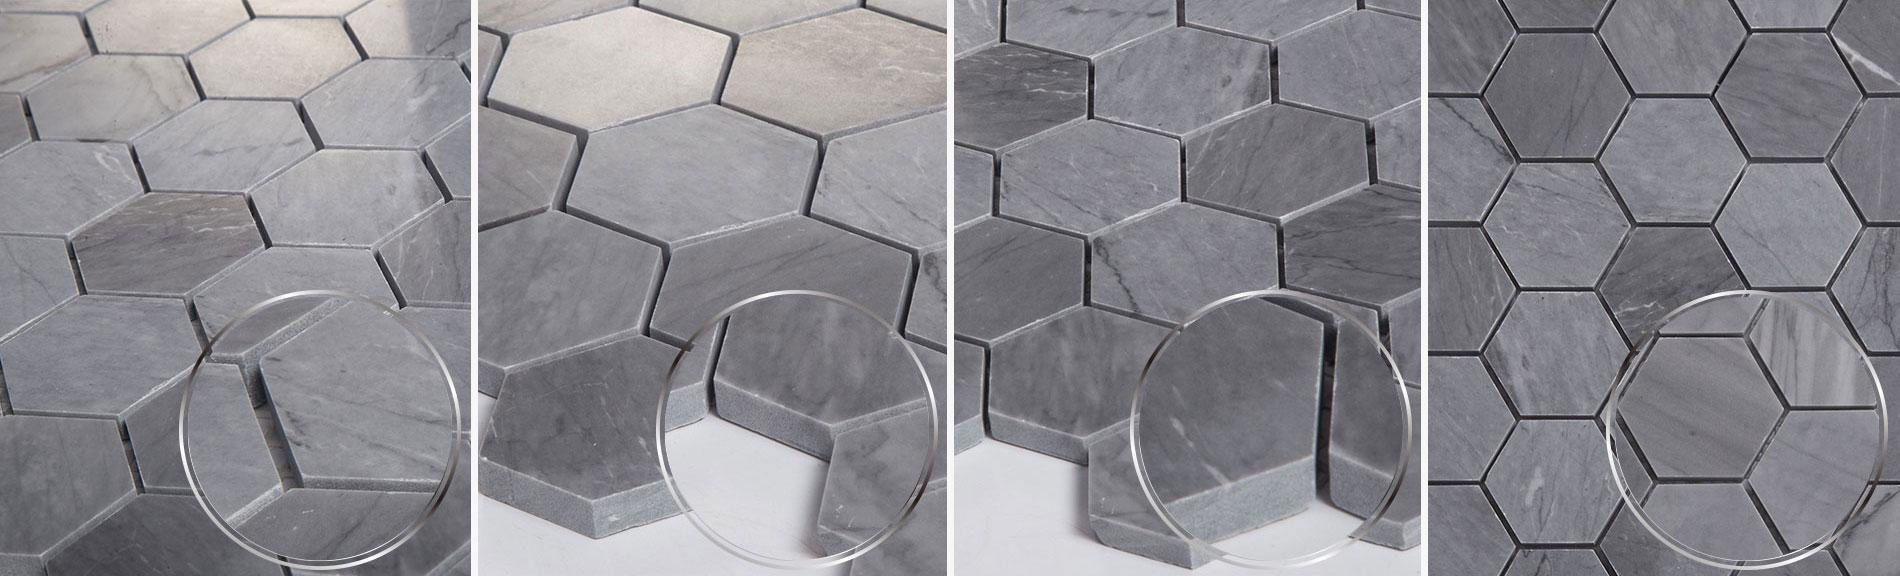 Blue-Hexagon-Stone-Mosaics-Tiles-Bathroom-Floors-6